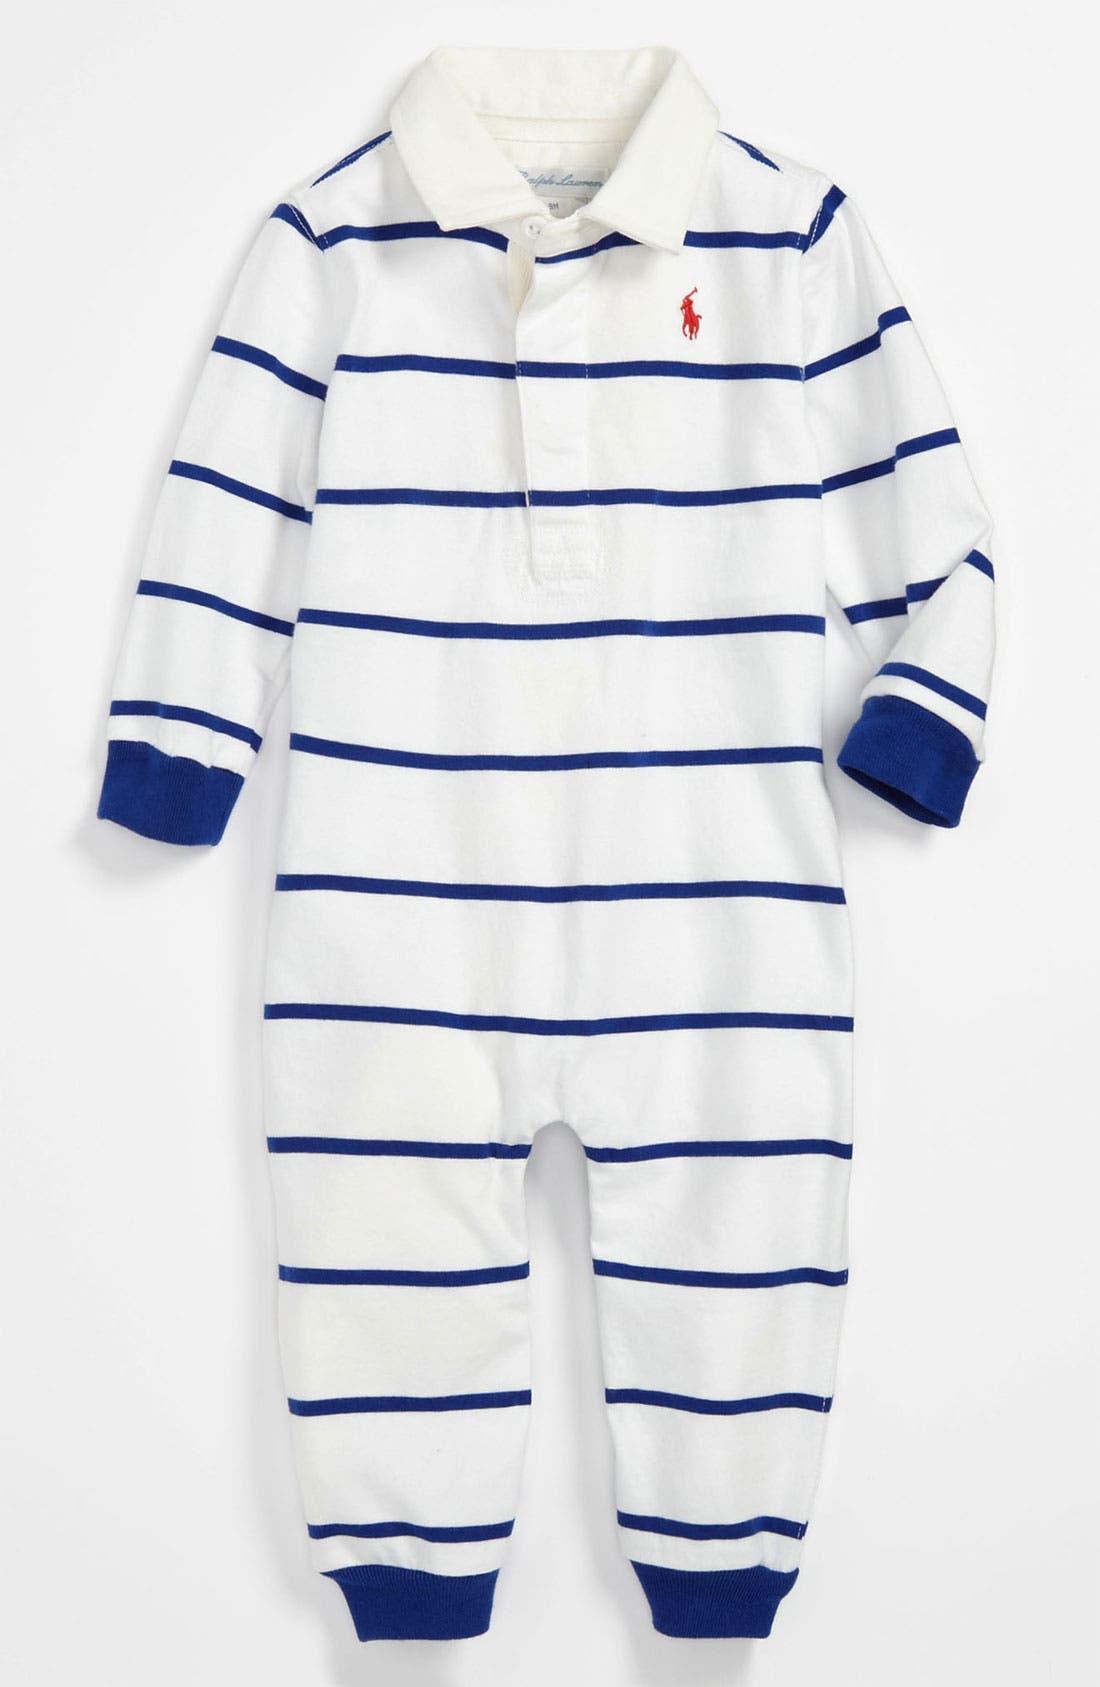 Main Image - Ralph Lauren Stripe Romper (Infant)